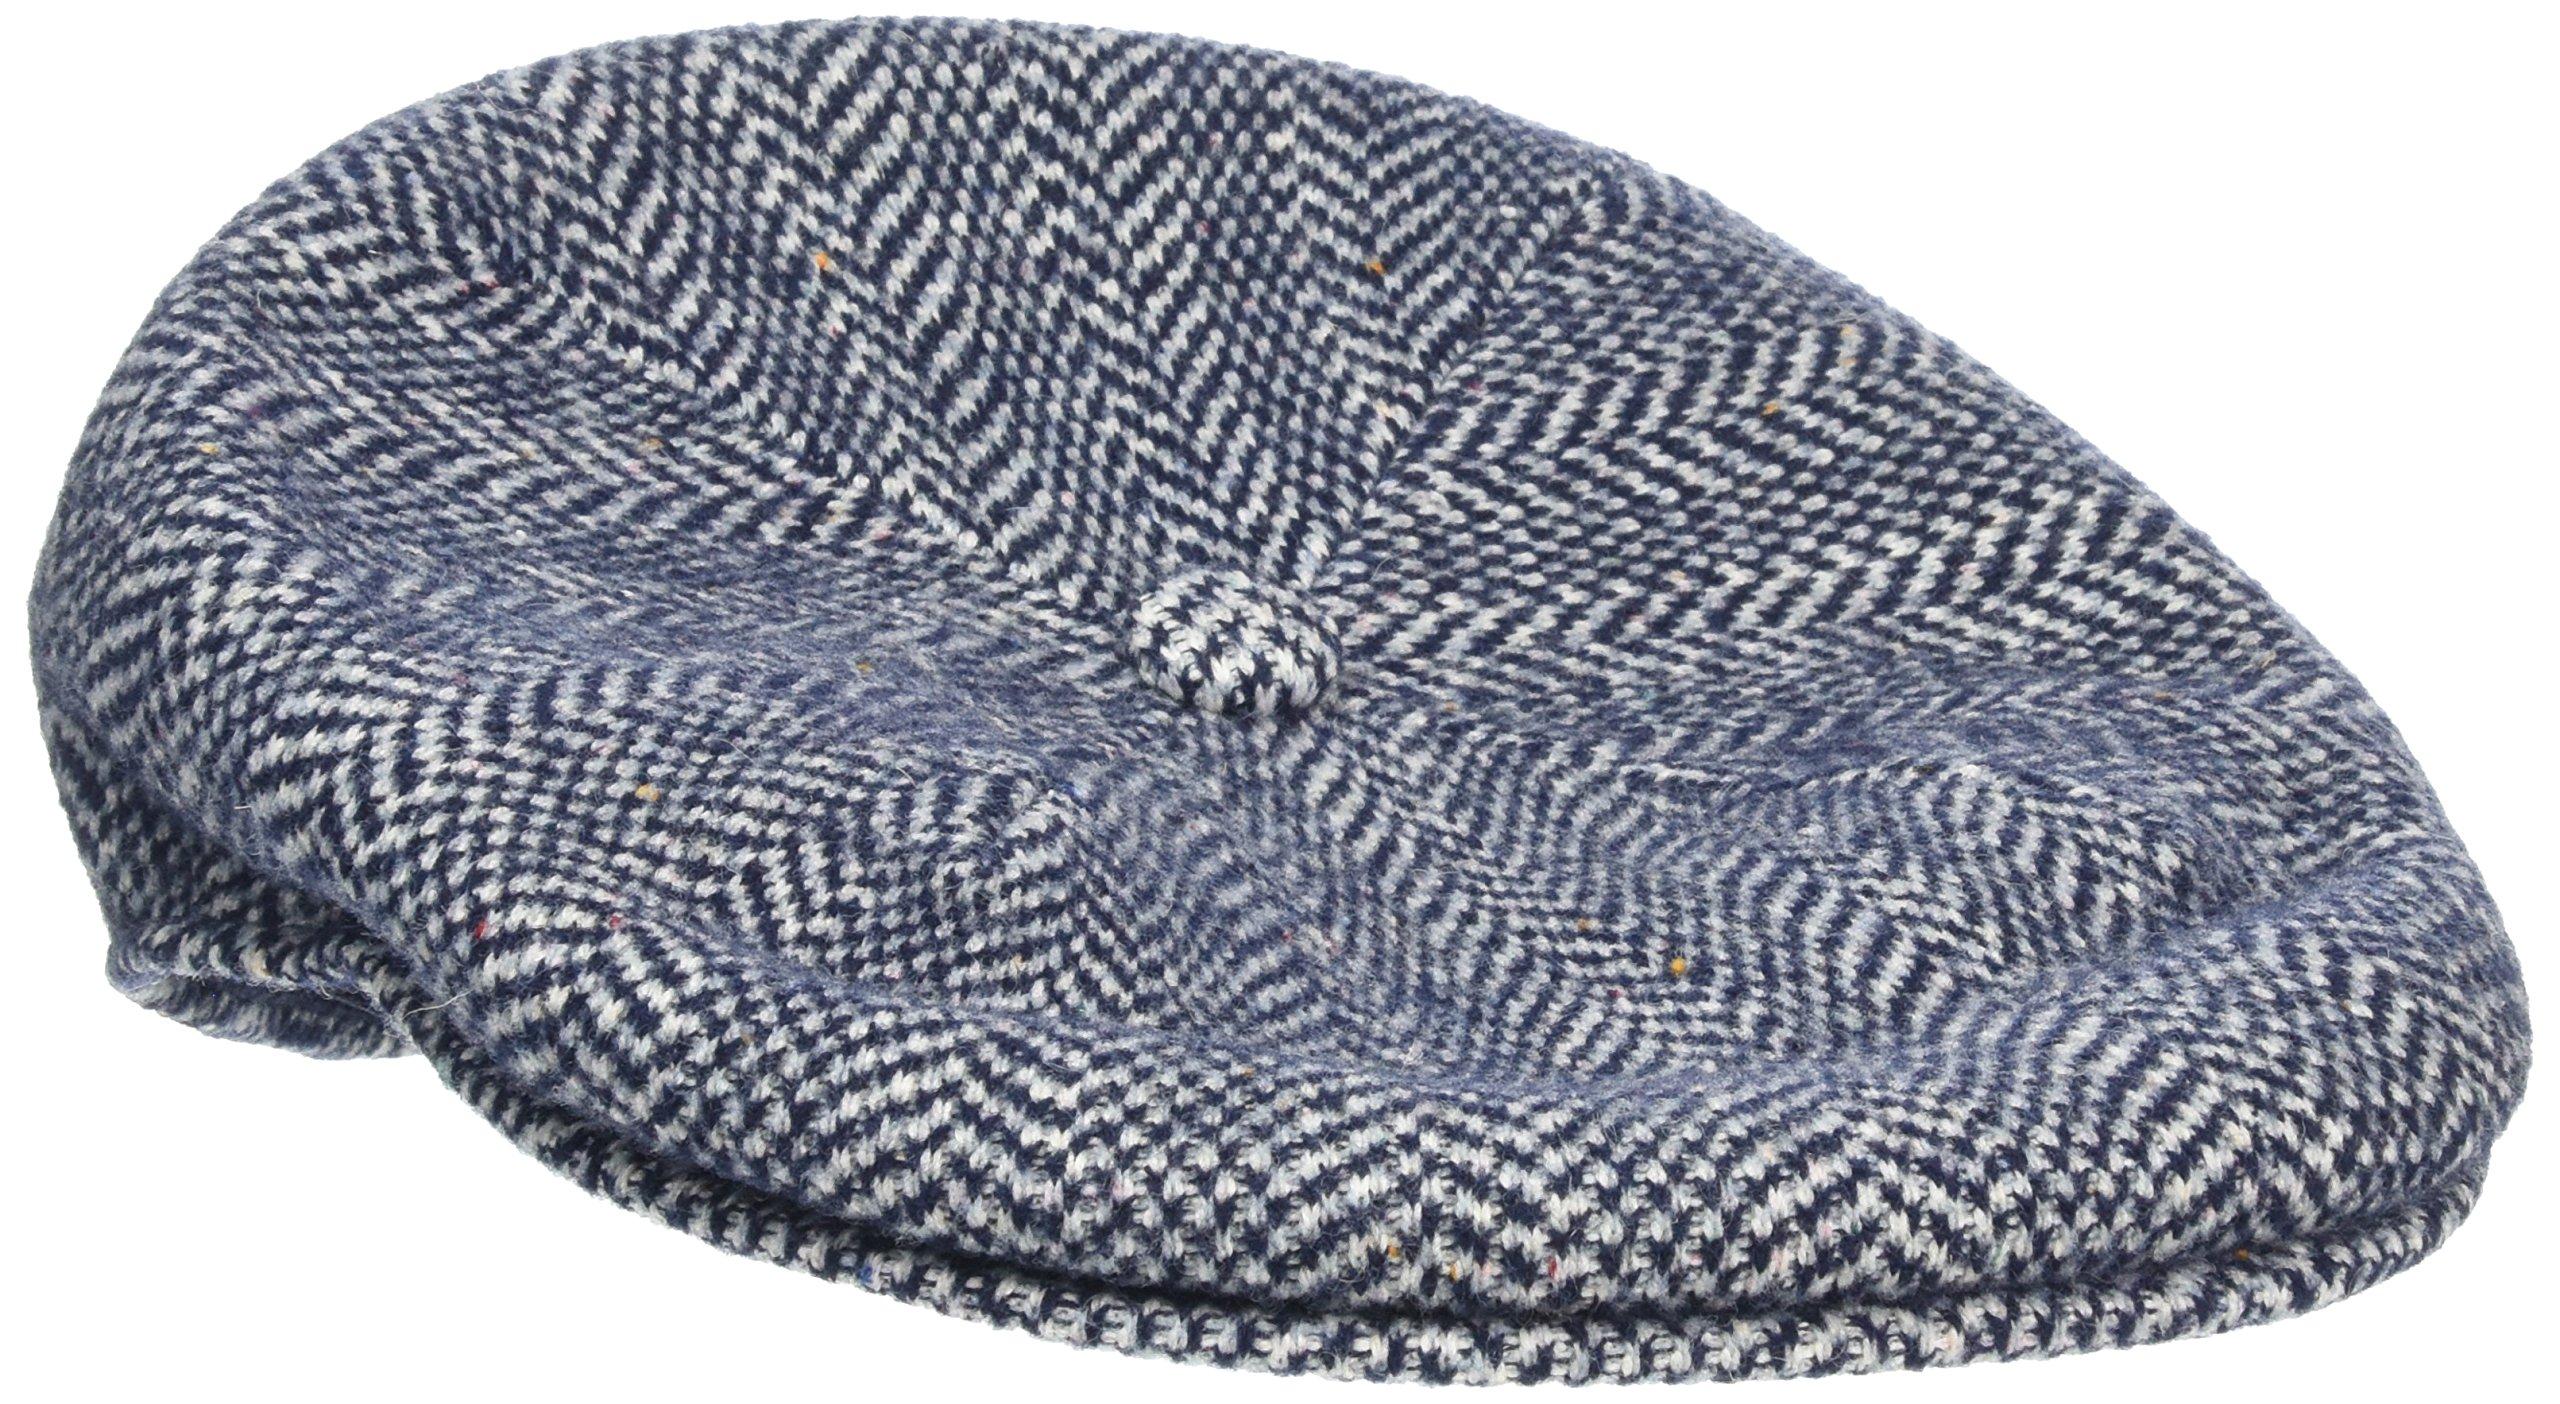 Kangol Unisex-Adult's Wool Herringbone 504 Cap, Dark Blue, S by Kangol